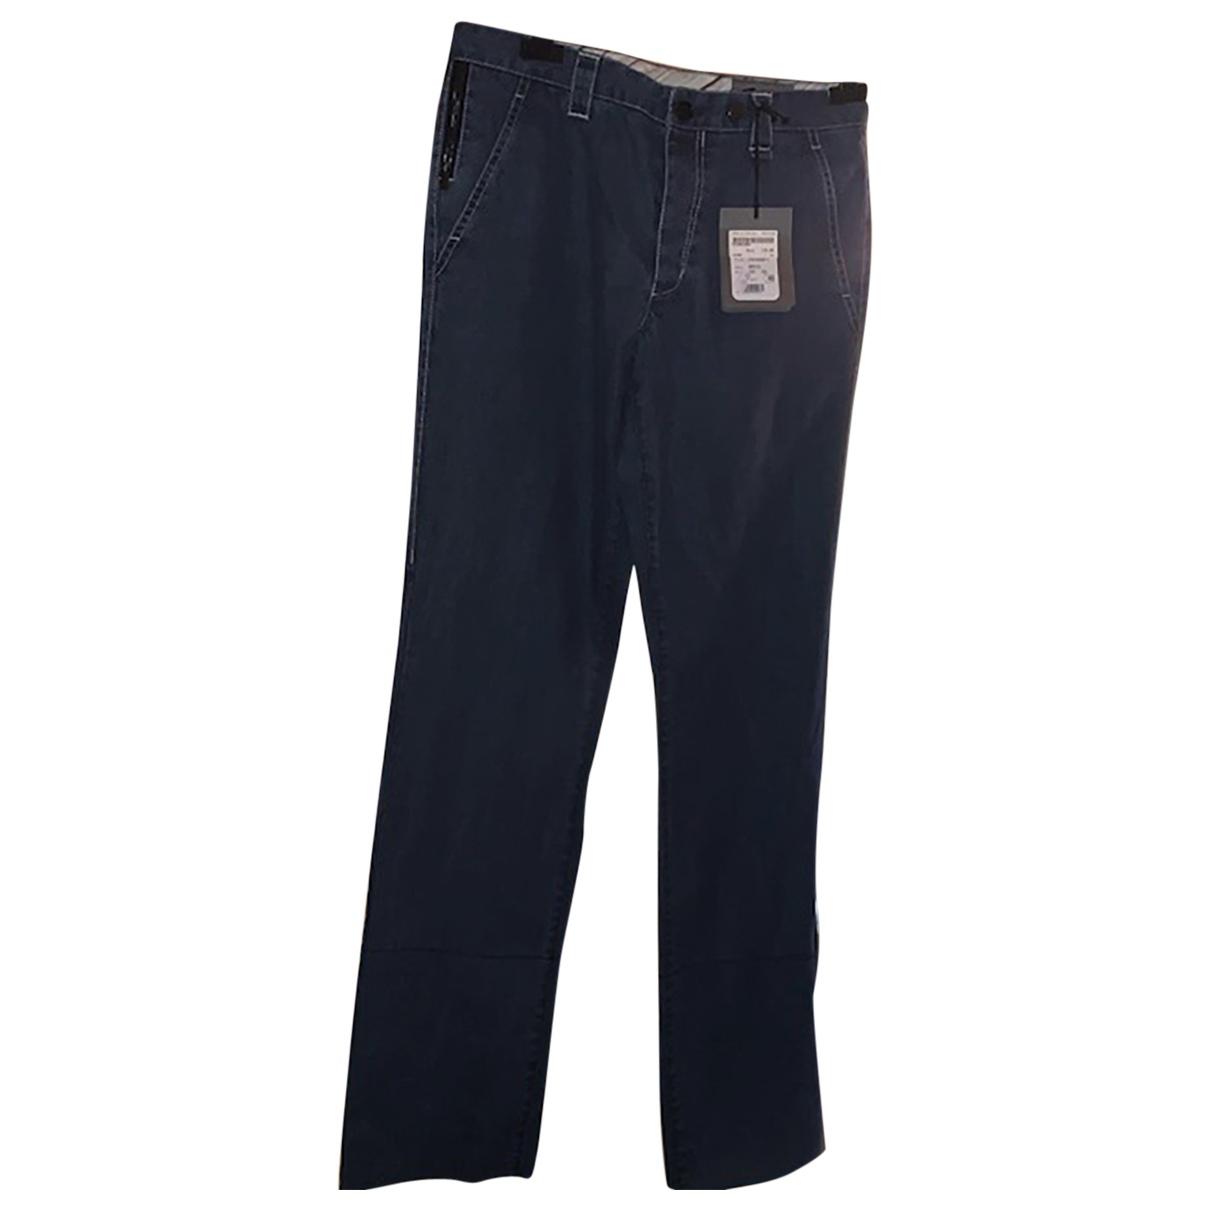 Allegri \N Blue Cotton Jeans for Men 33 US